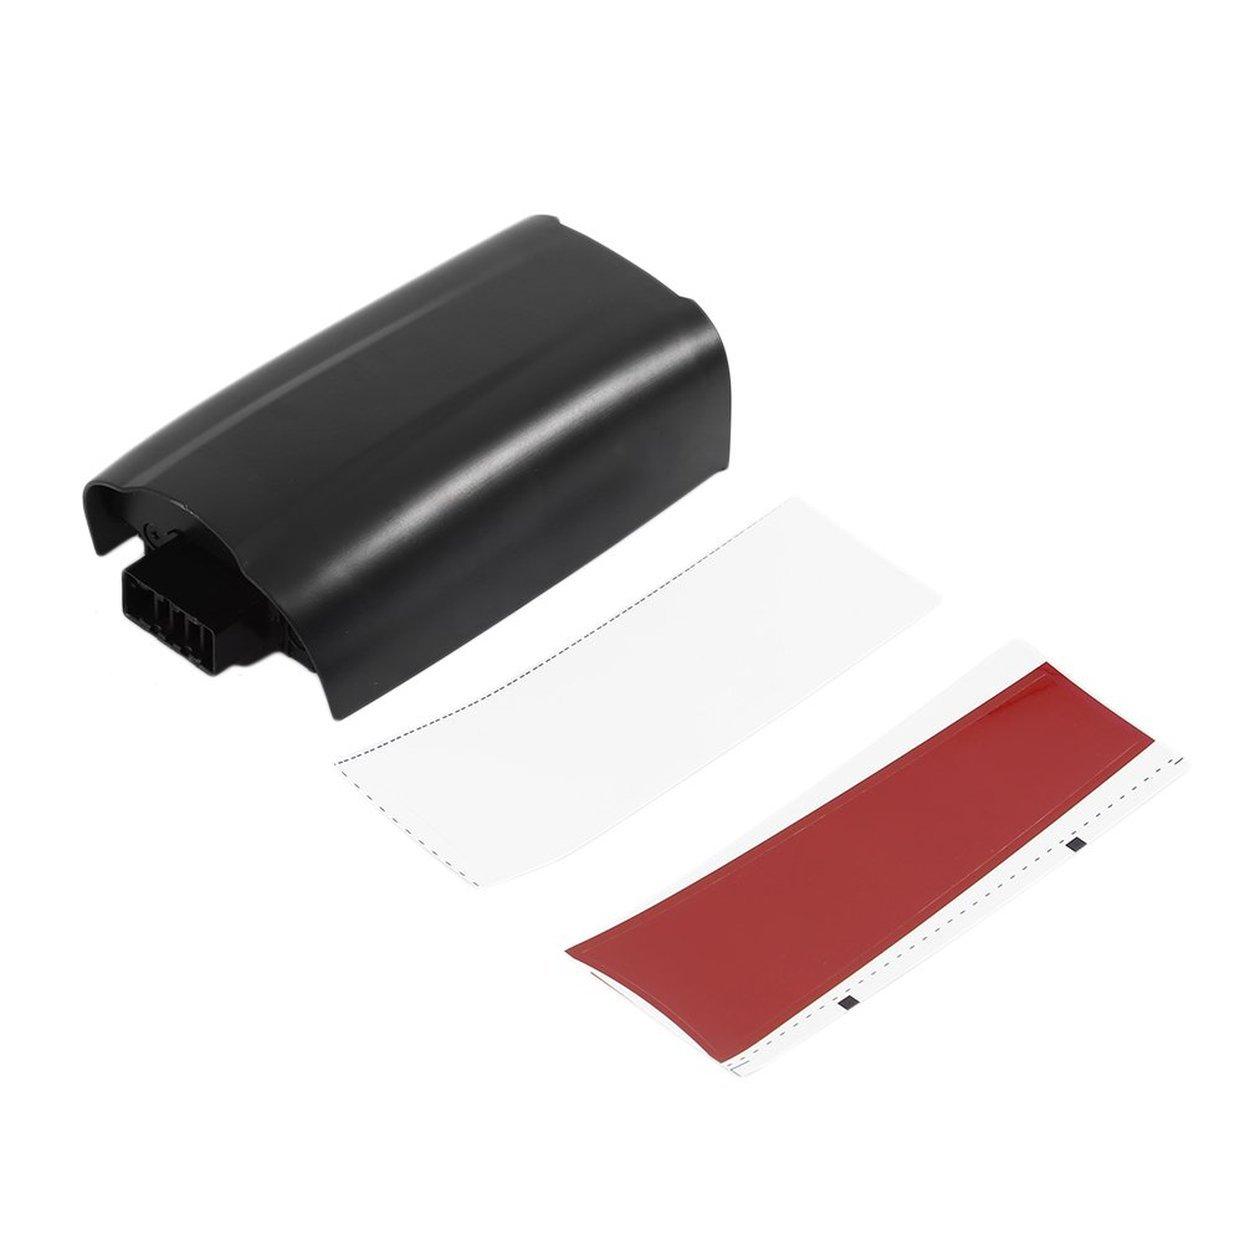 Dailyinshop 3100Mah Lithum-Ion Polymer Baterí a Recargable para Loro Bebop 2 Drone